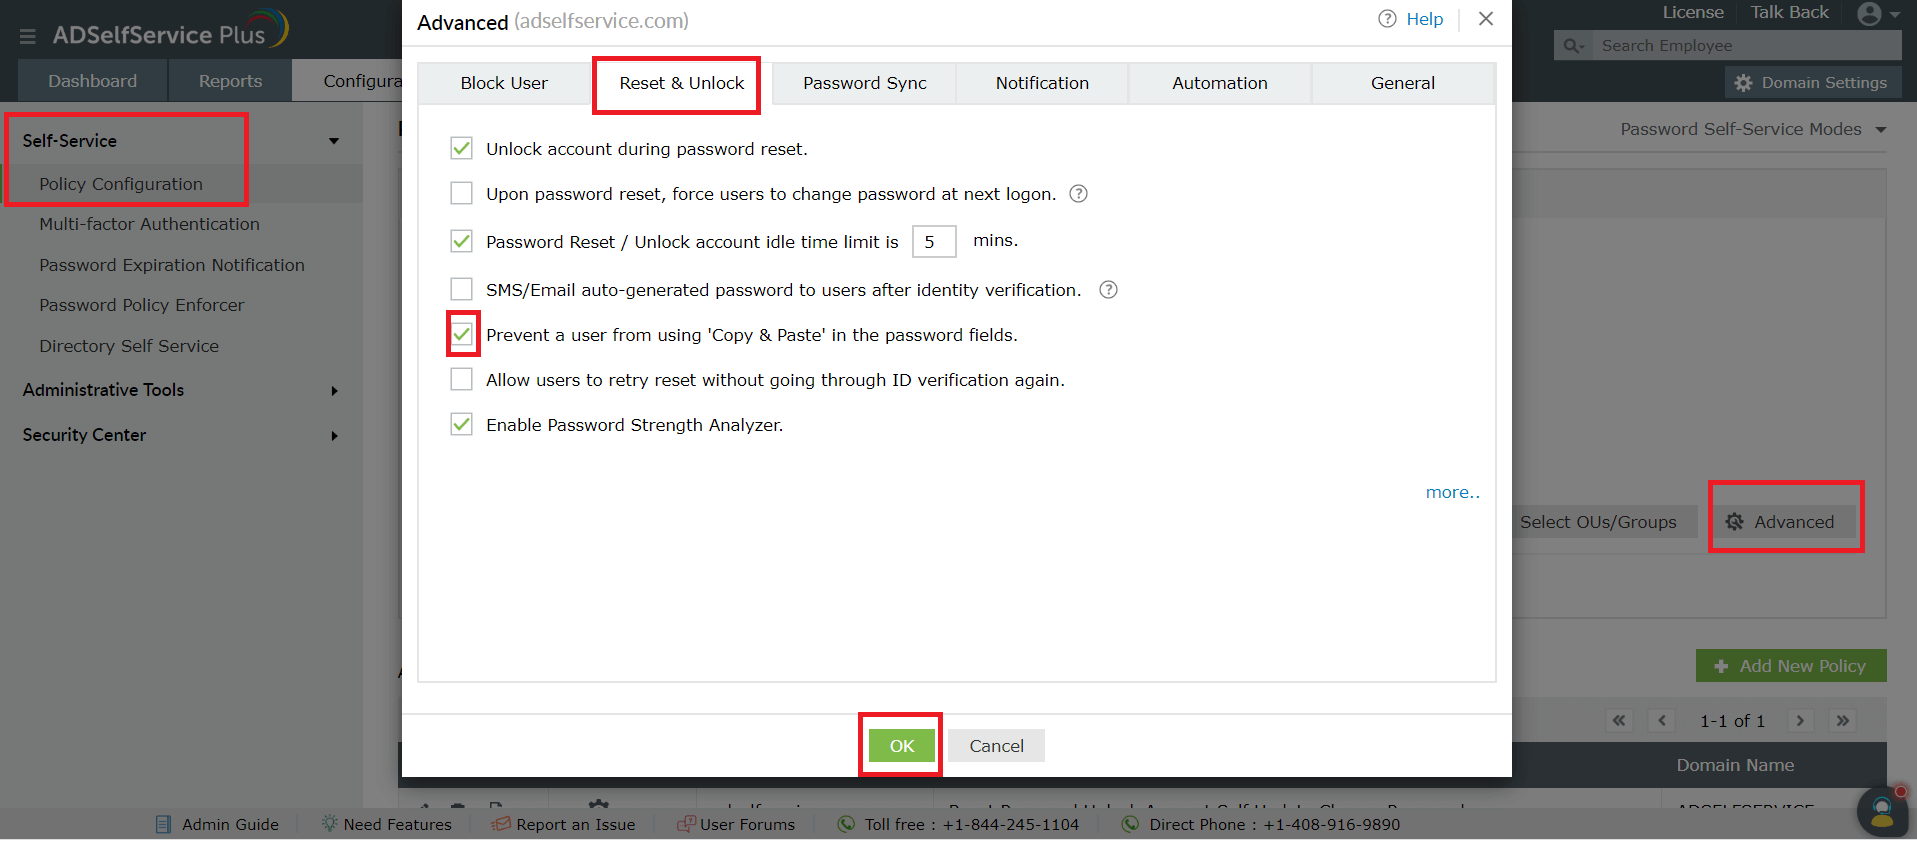 copy-paste-prevention-during-password-reset